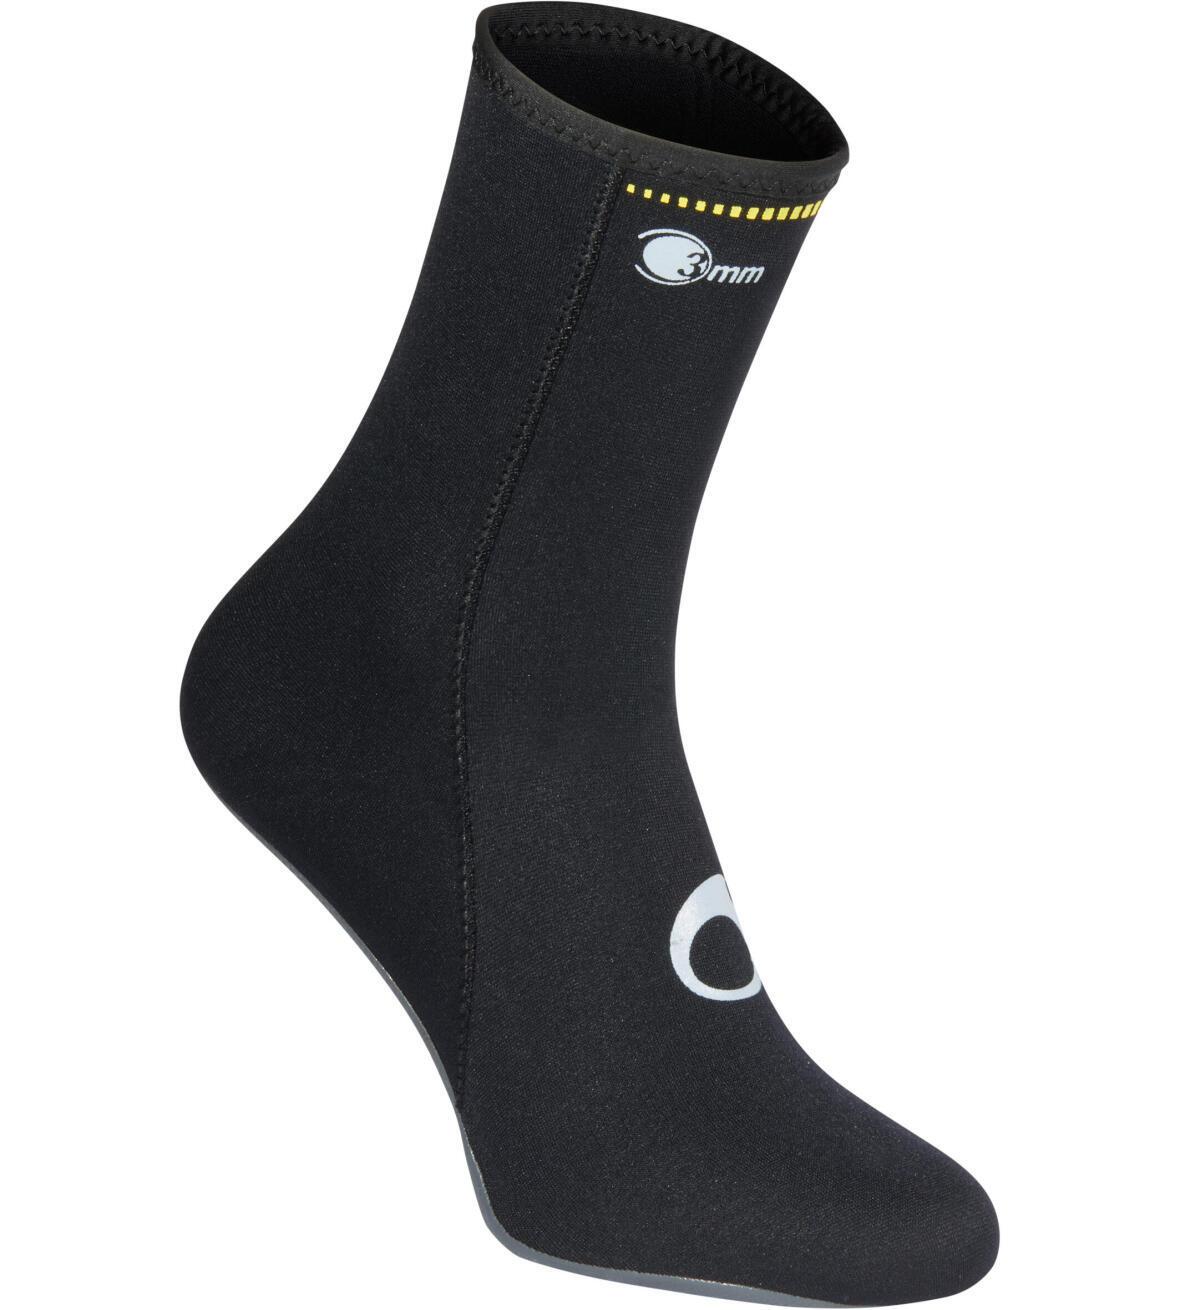 diving socks scd 500 3mm